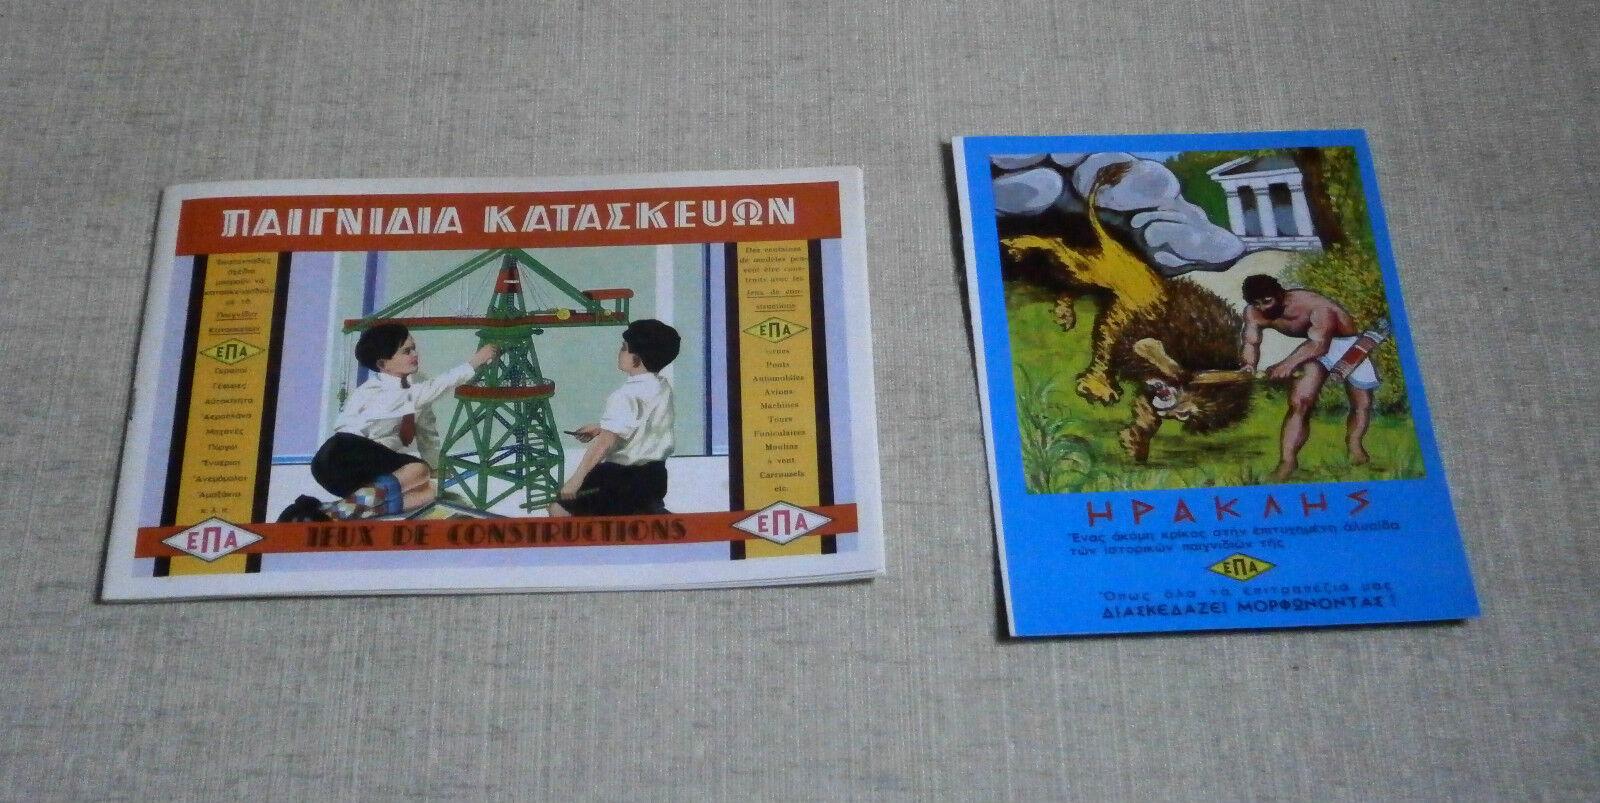 EPA TOY CONSTRUCTIONS NIB NEW MADE IN GREECE 70's 70's 70's MECCANO METAL VTG RARE 56de75